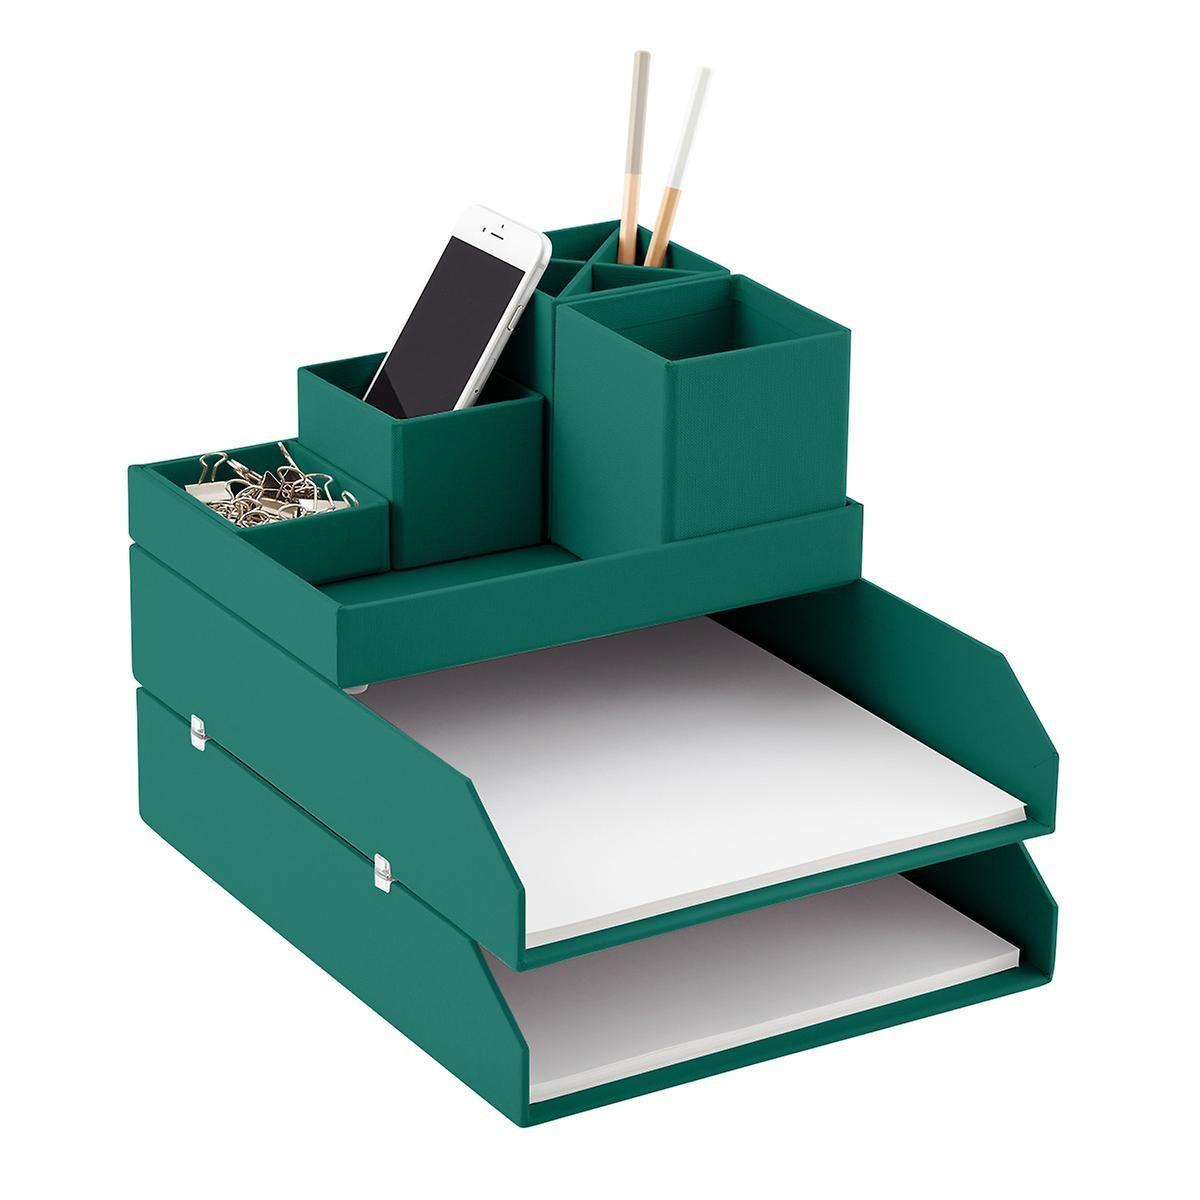 Bigso Emerald Green Stockholm Desktop Organizer Desktop Organization Desk Organization Diy Cardboard Organizer